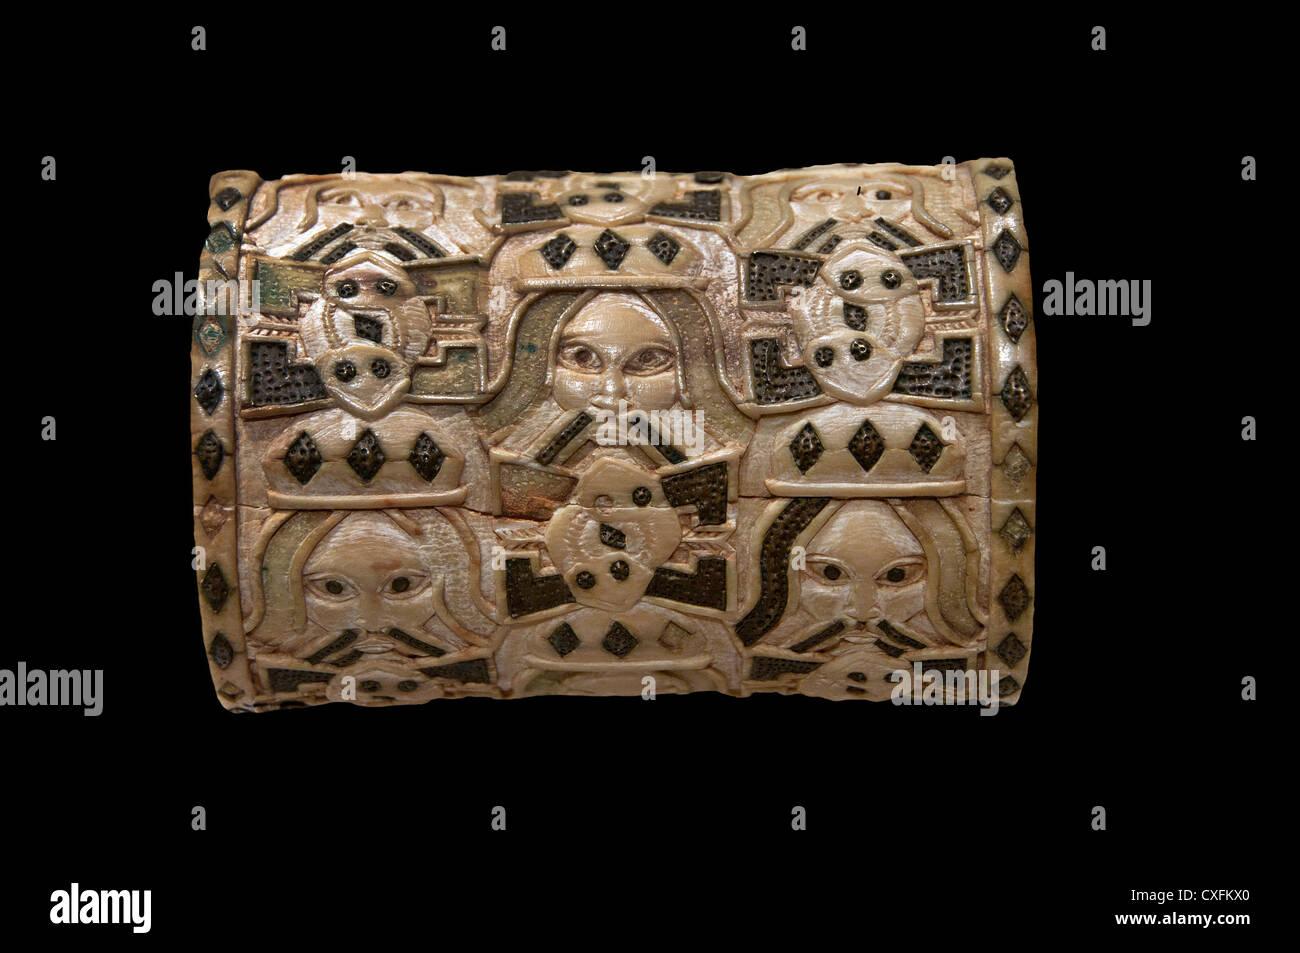 Pulsera 1550 - 1680 Tribunal de Nigeria Benin Edo pueblos de África de marfil Foto de stock